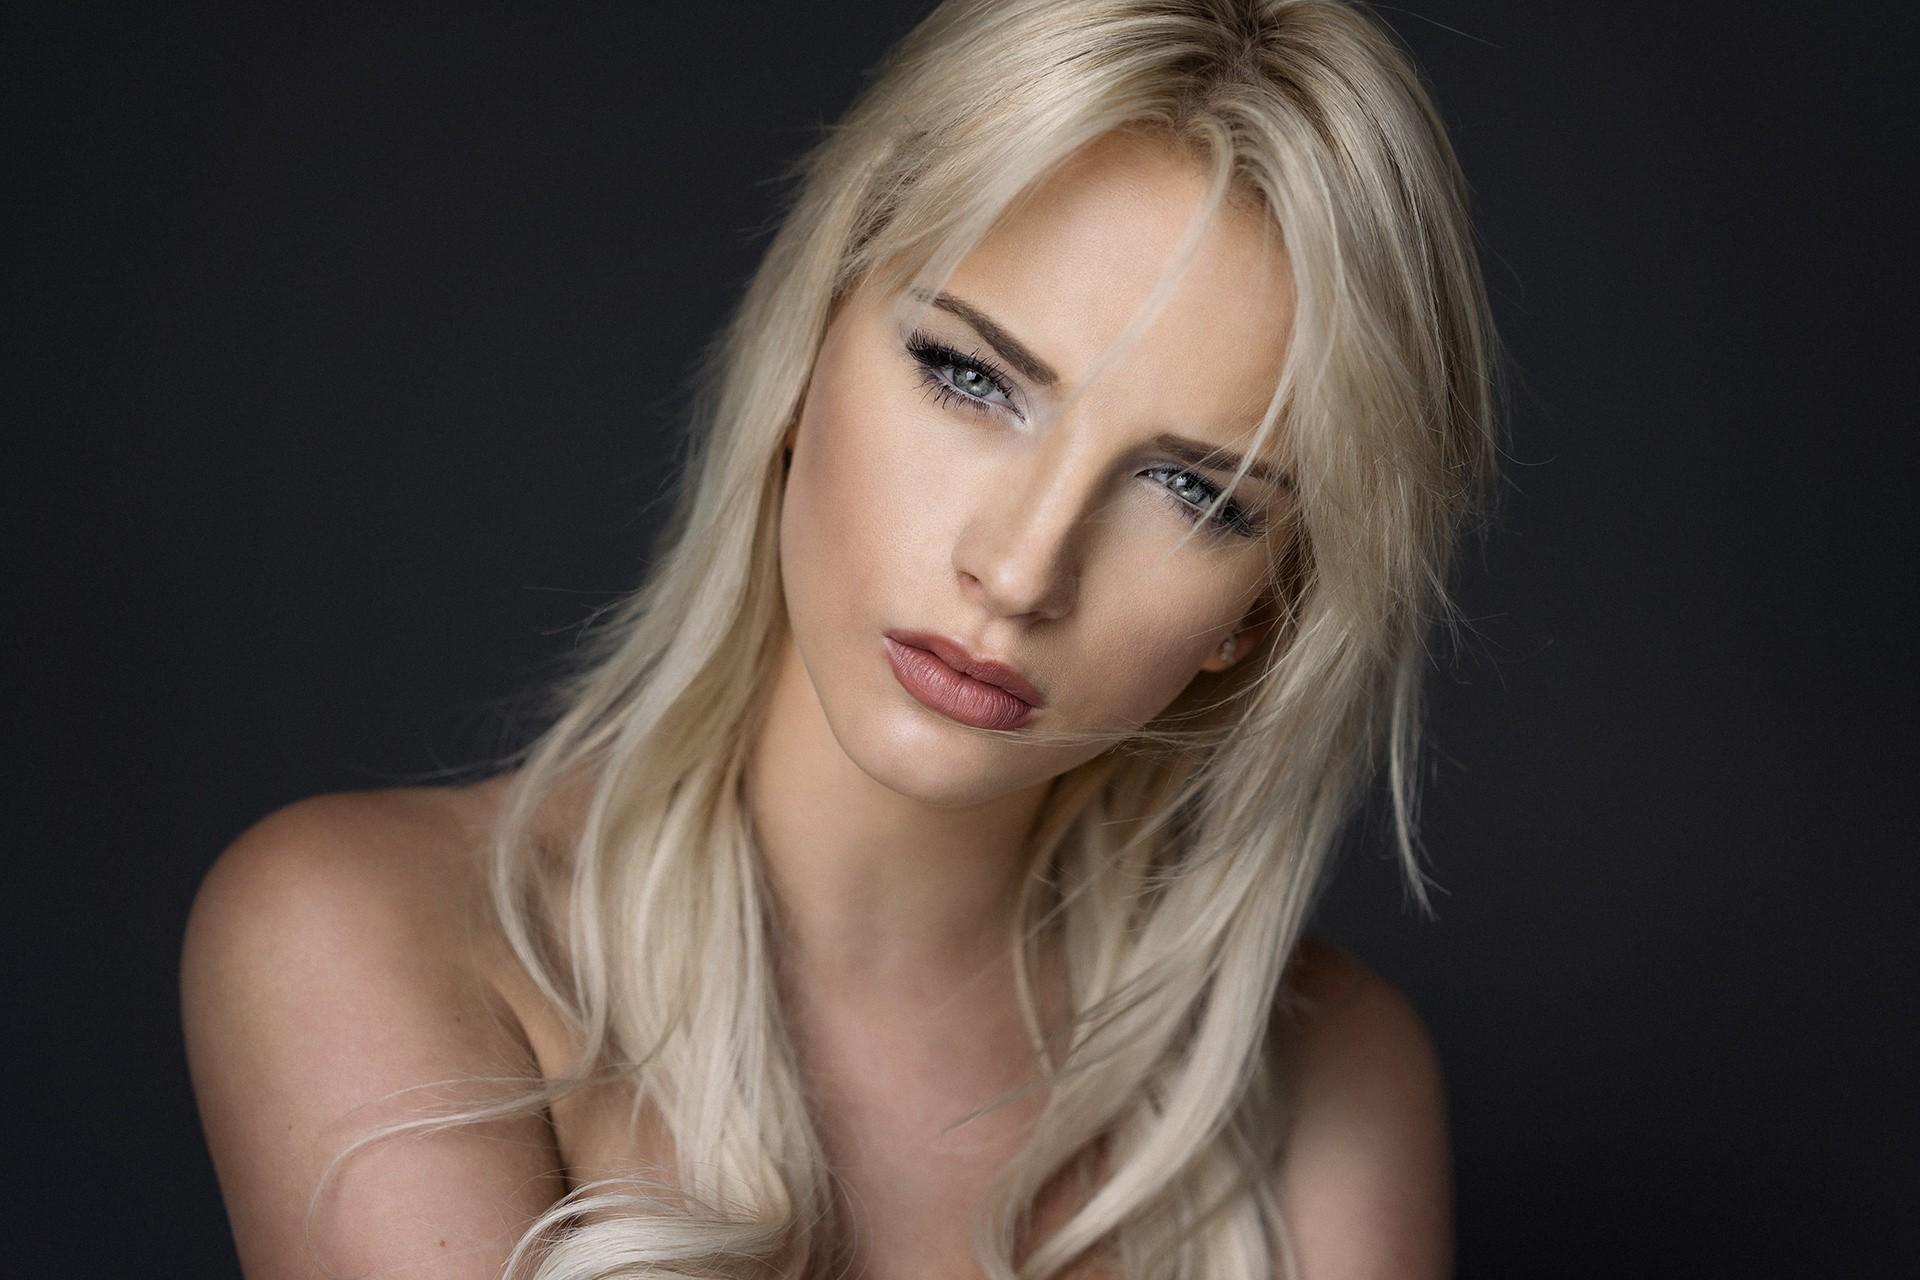 Wallpaper Face Women Blonde Simple Background Long Hair Blue